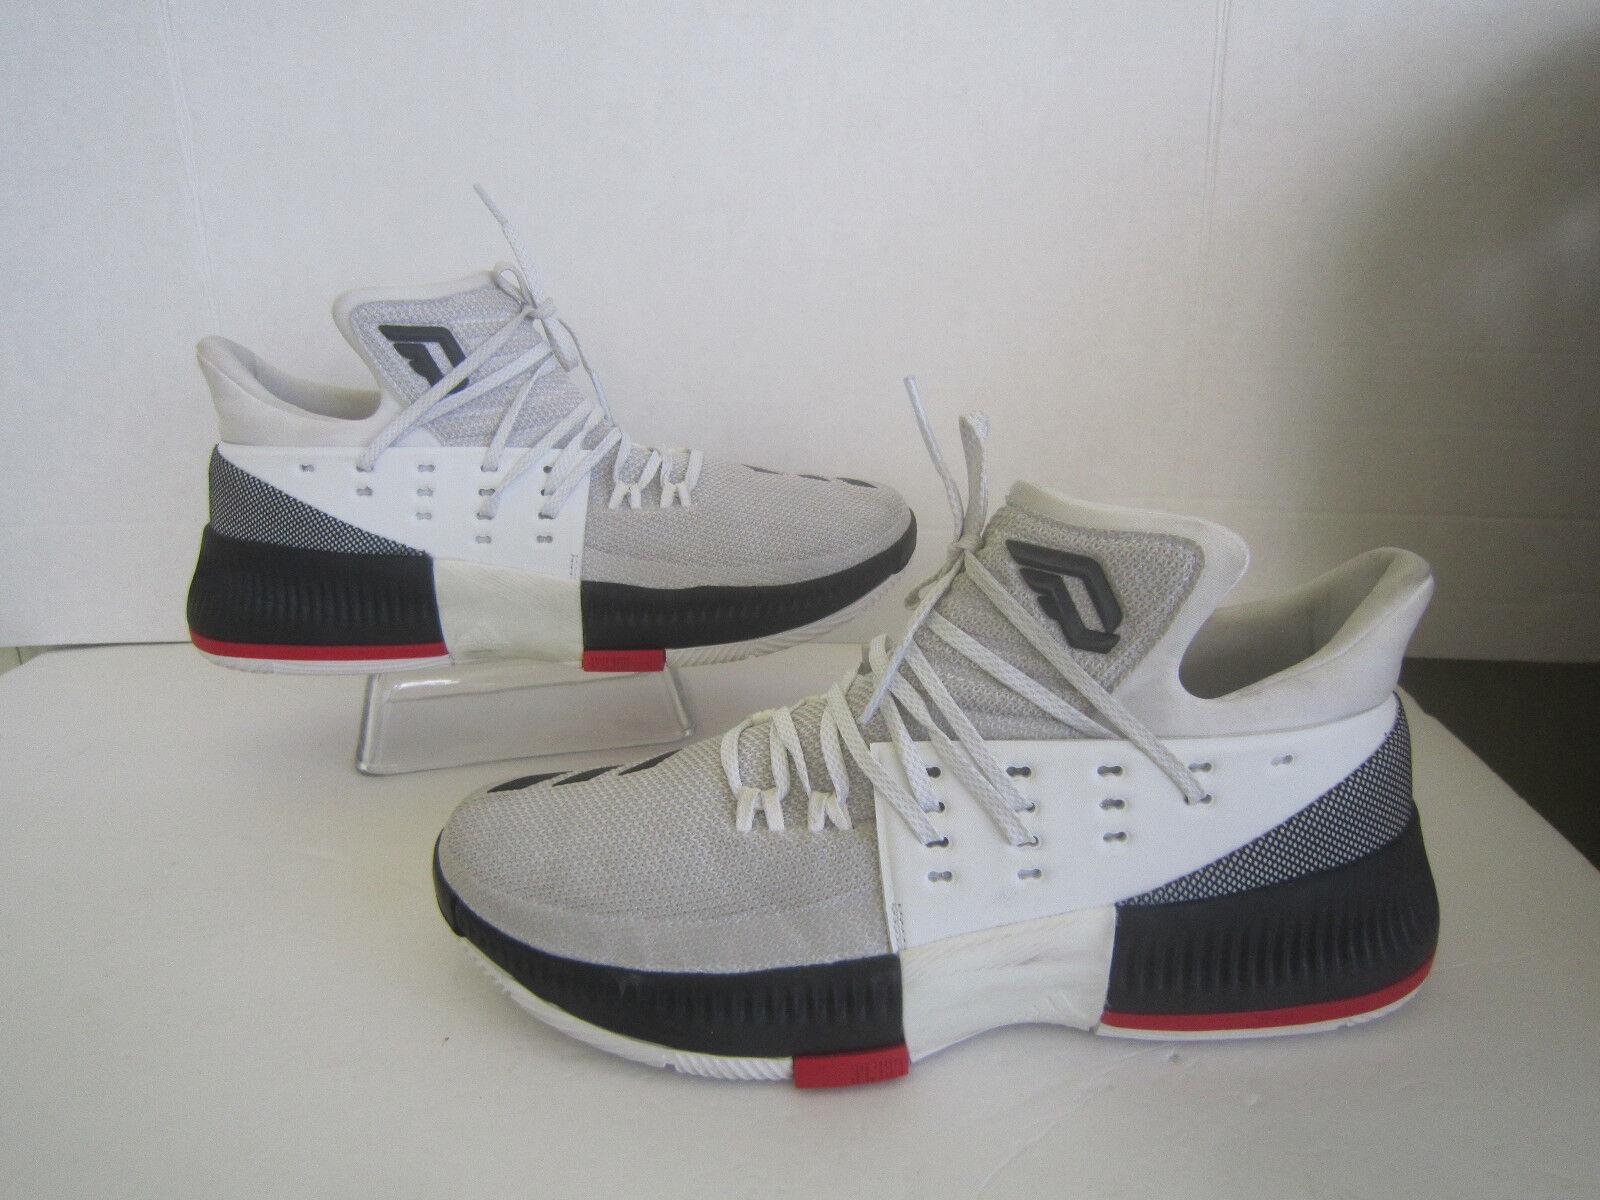 Adidas D Lillard 3 3 3 III Damian Dame 3, Art No. BB8268, Men's Basketball, Size 11 739600